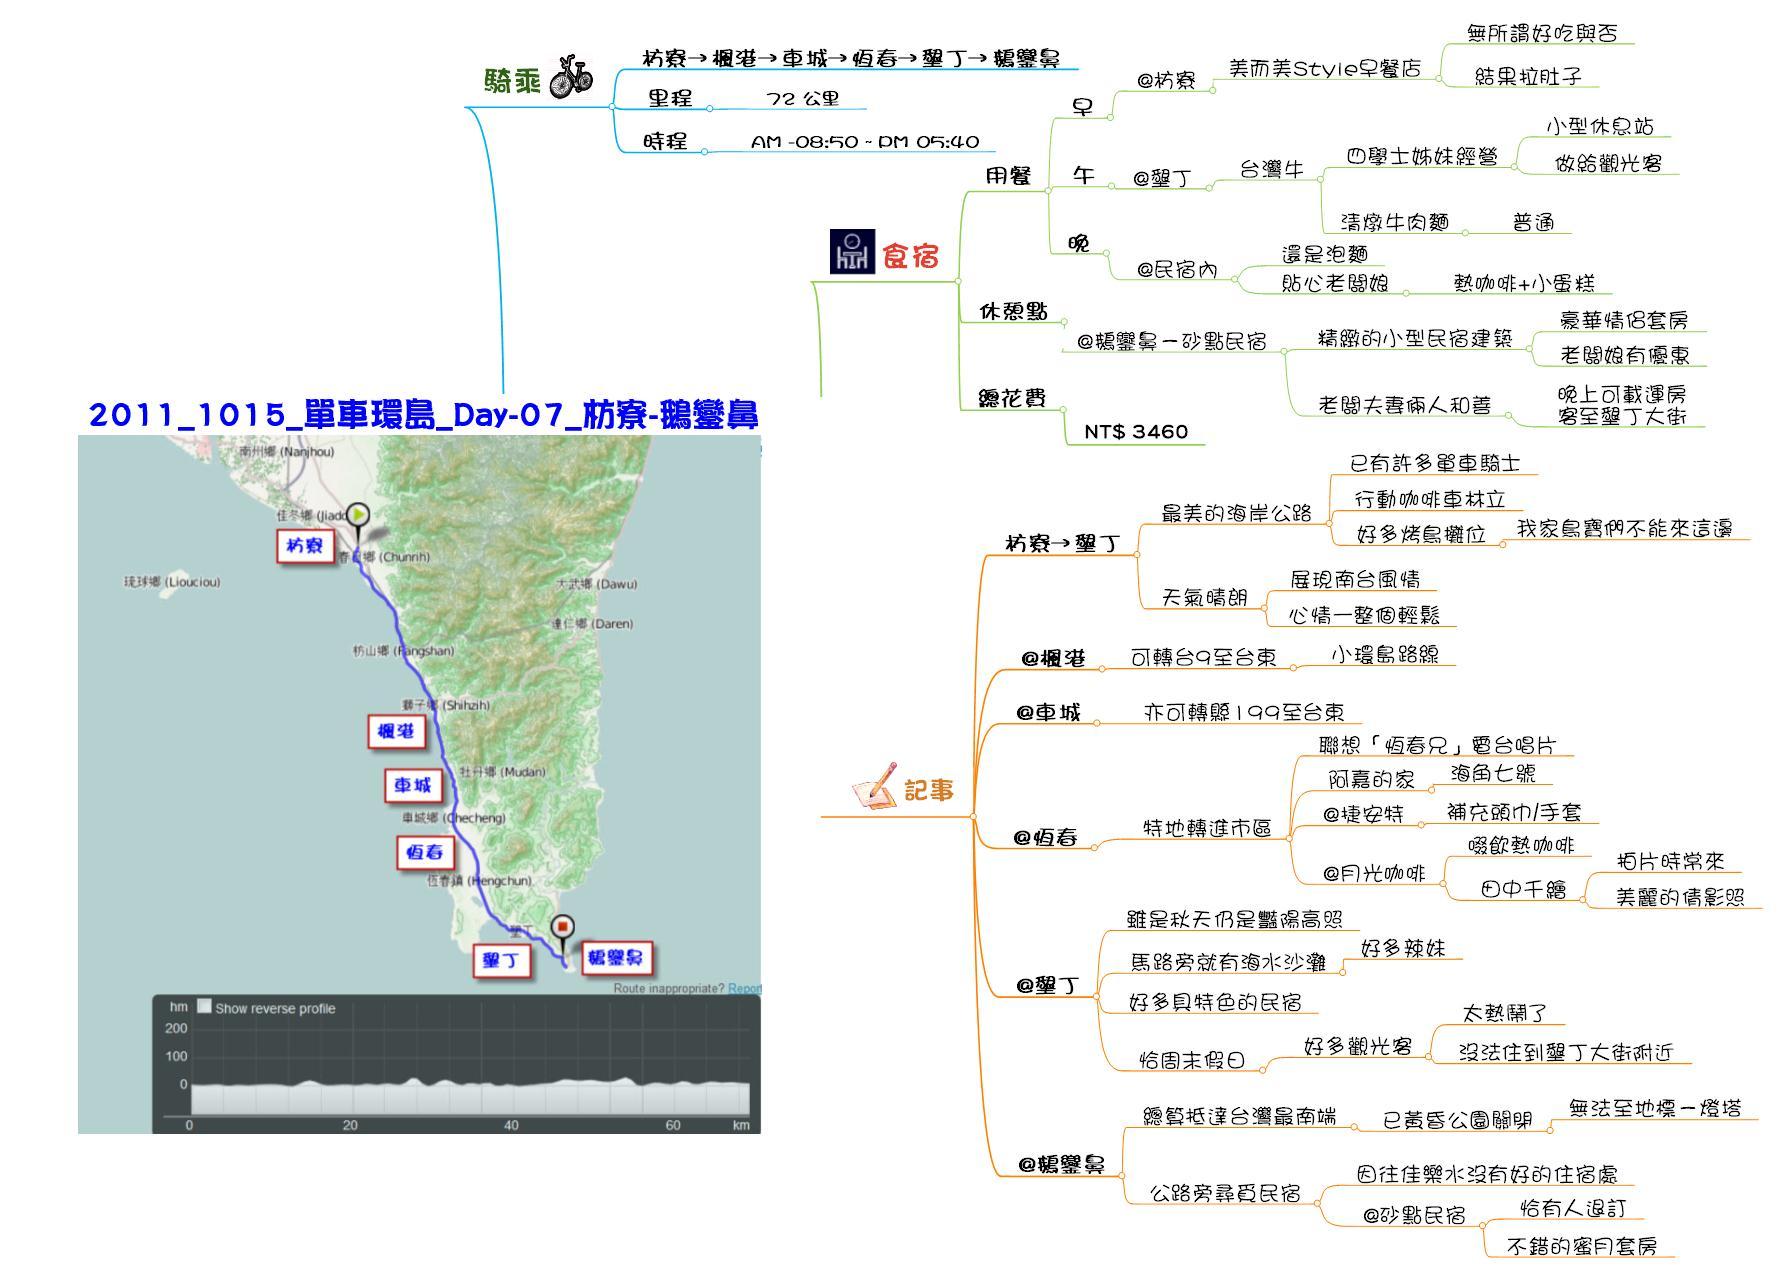 2011.10.09-15_Day_07_枋寮-鵝鑾鼻_心智圖